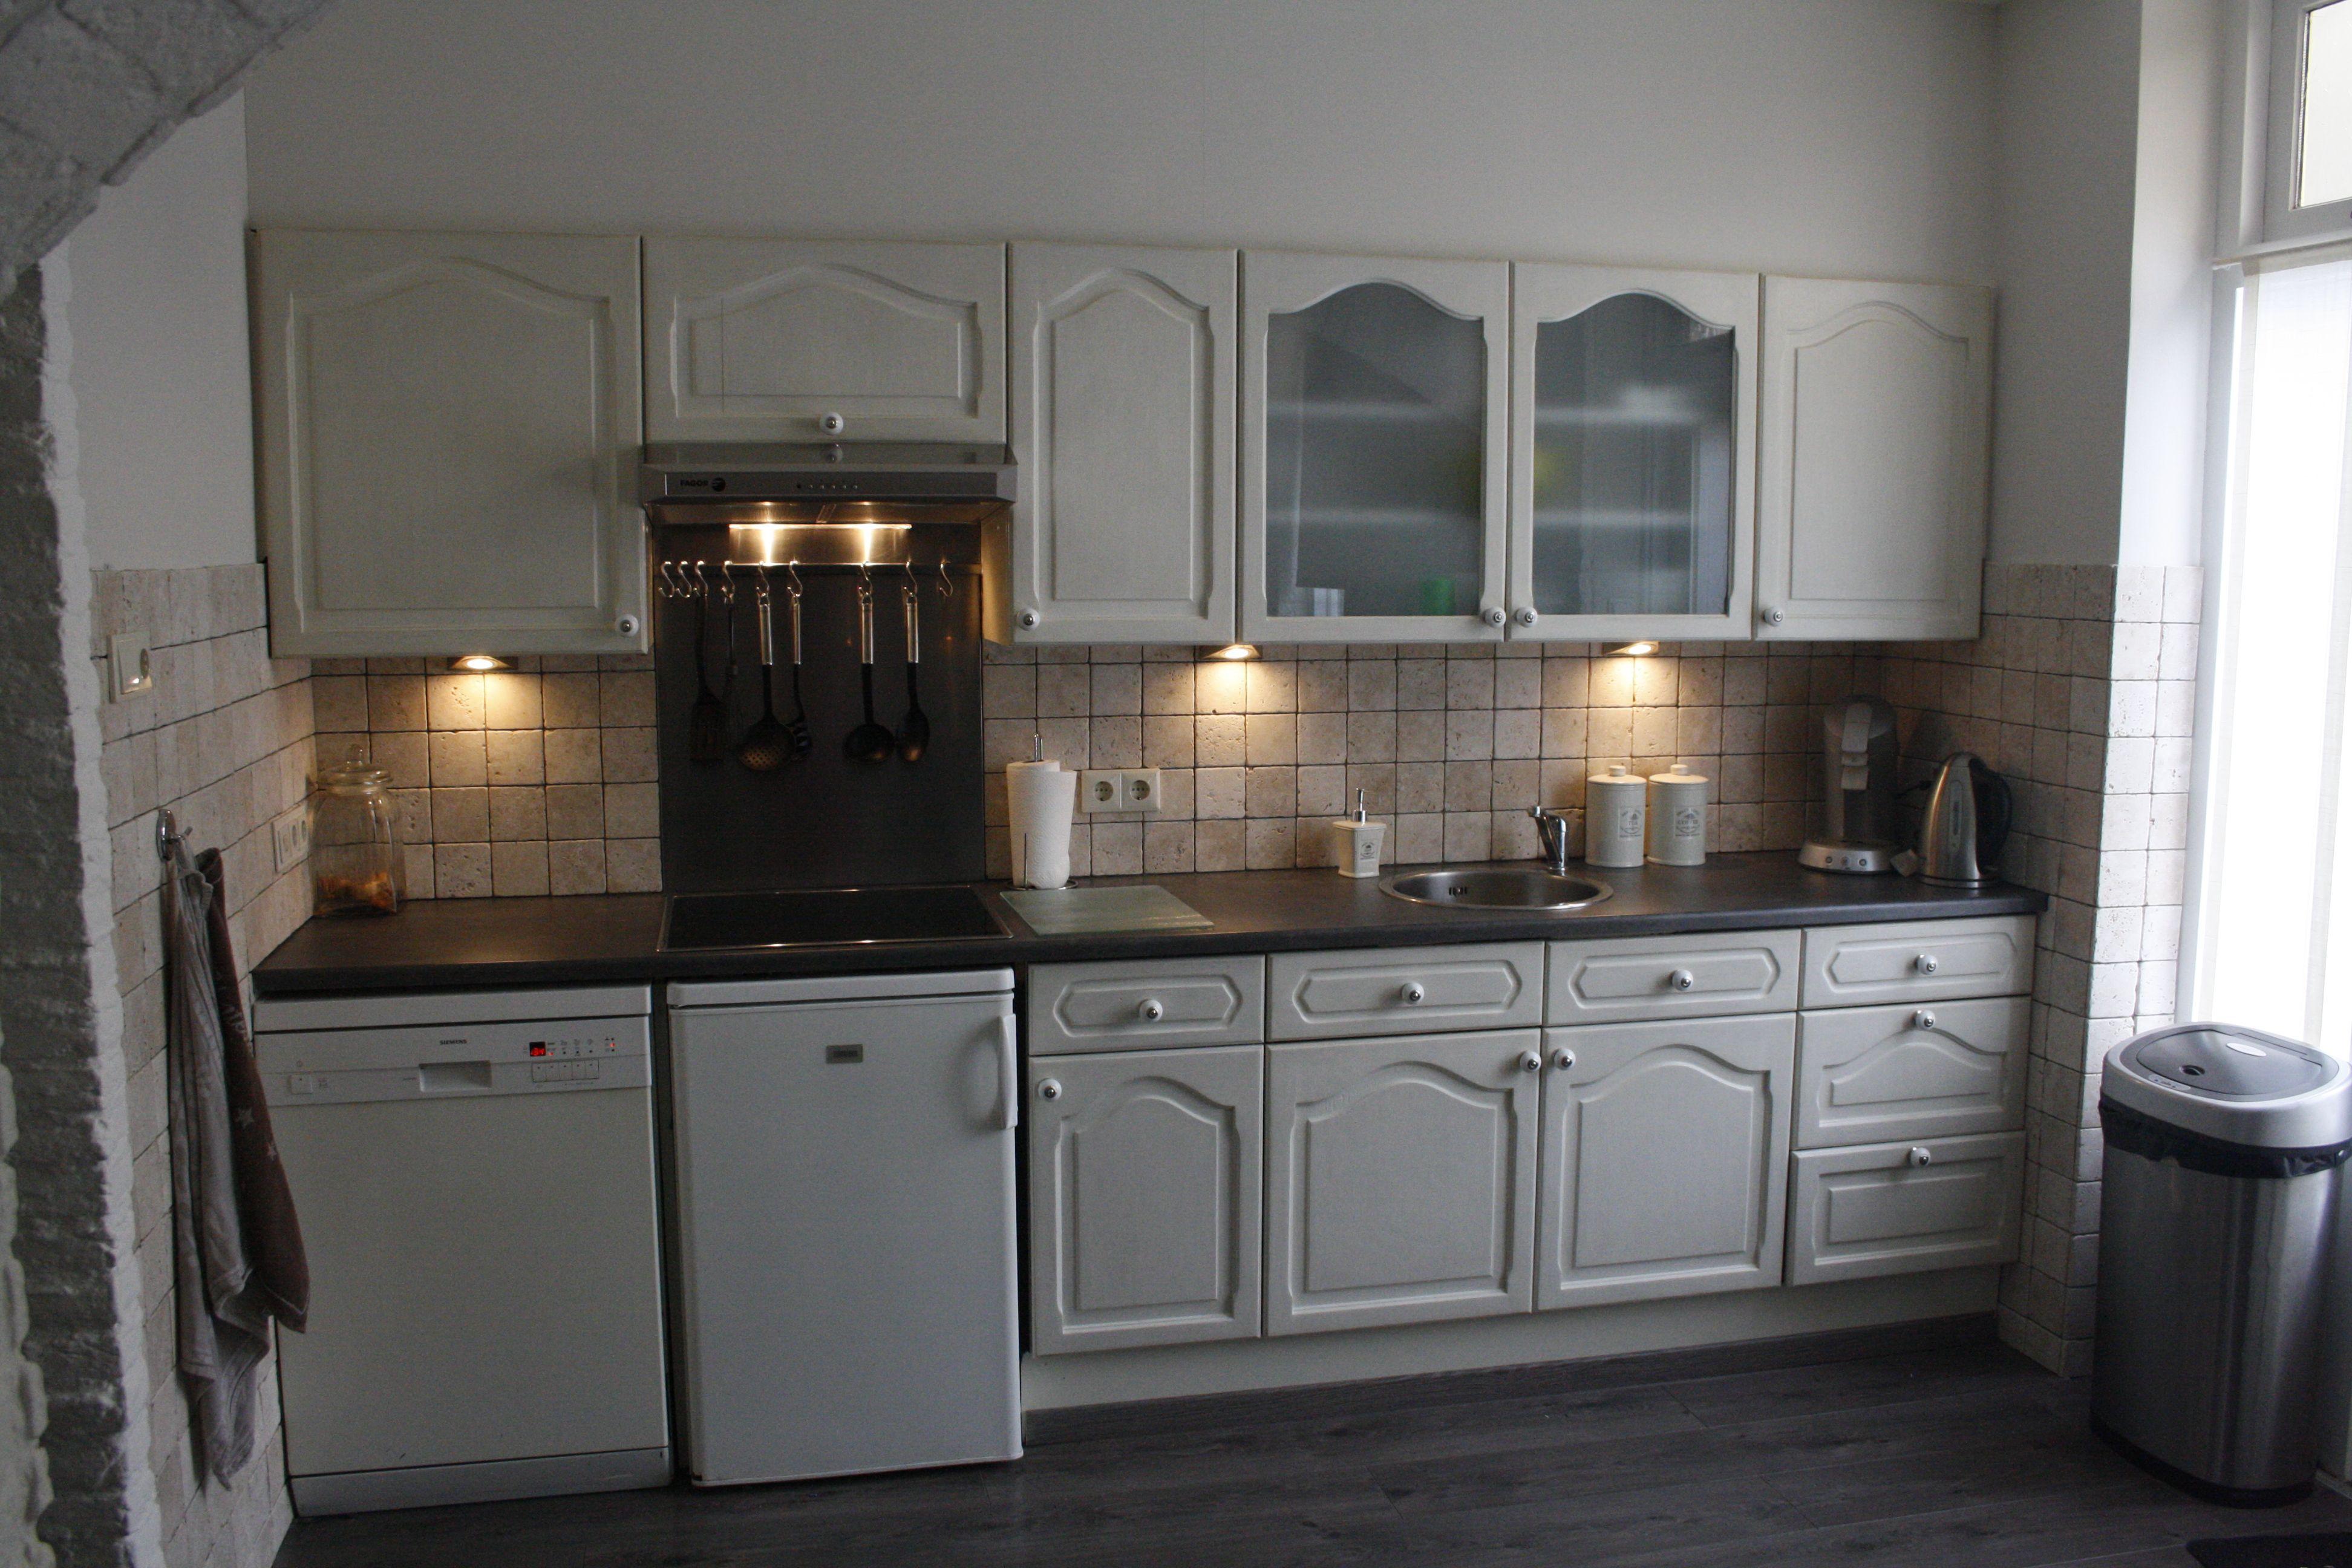 Oude eiken keuken white wash gemaakt deco pinterest keuken - Idee deco keuken grijs ...